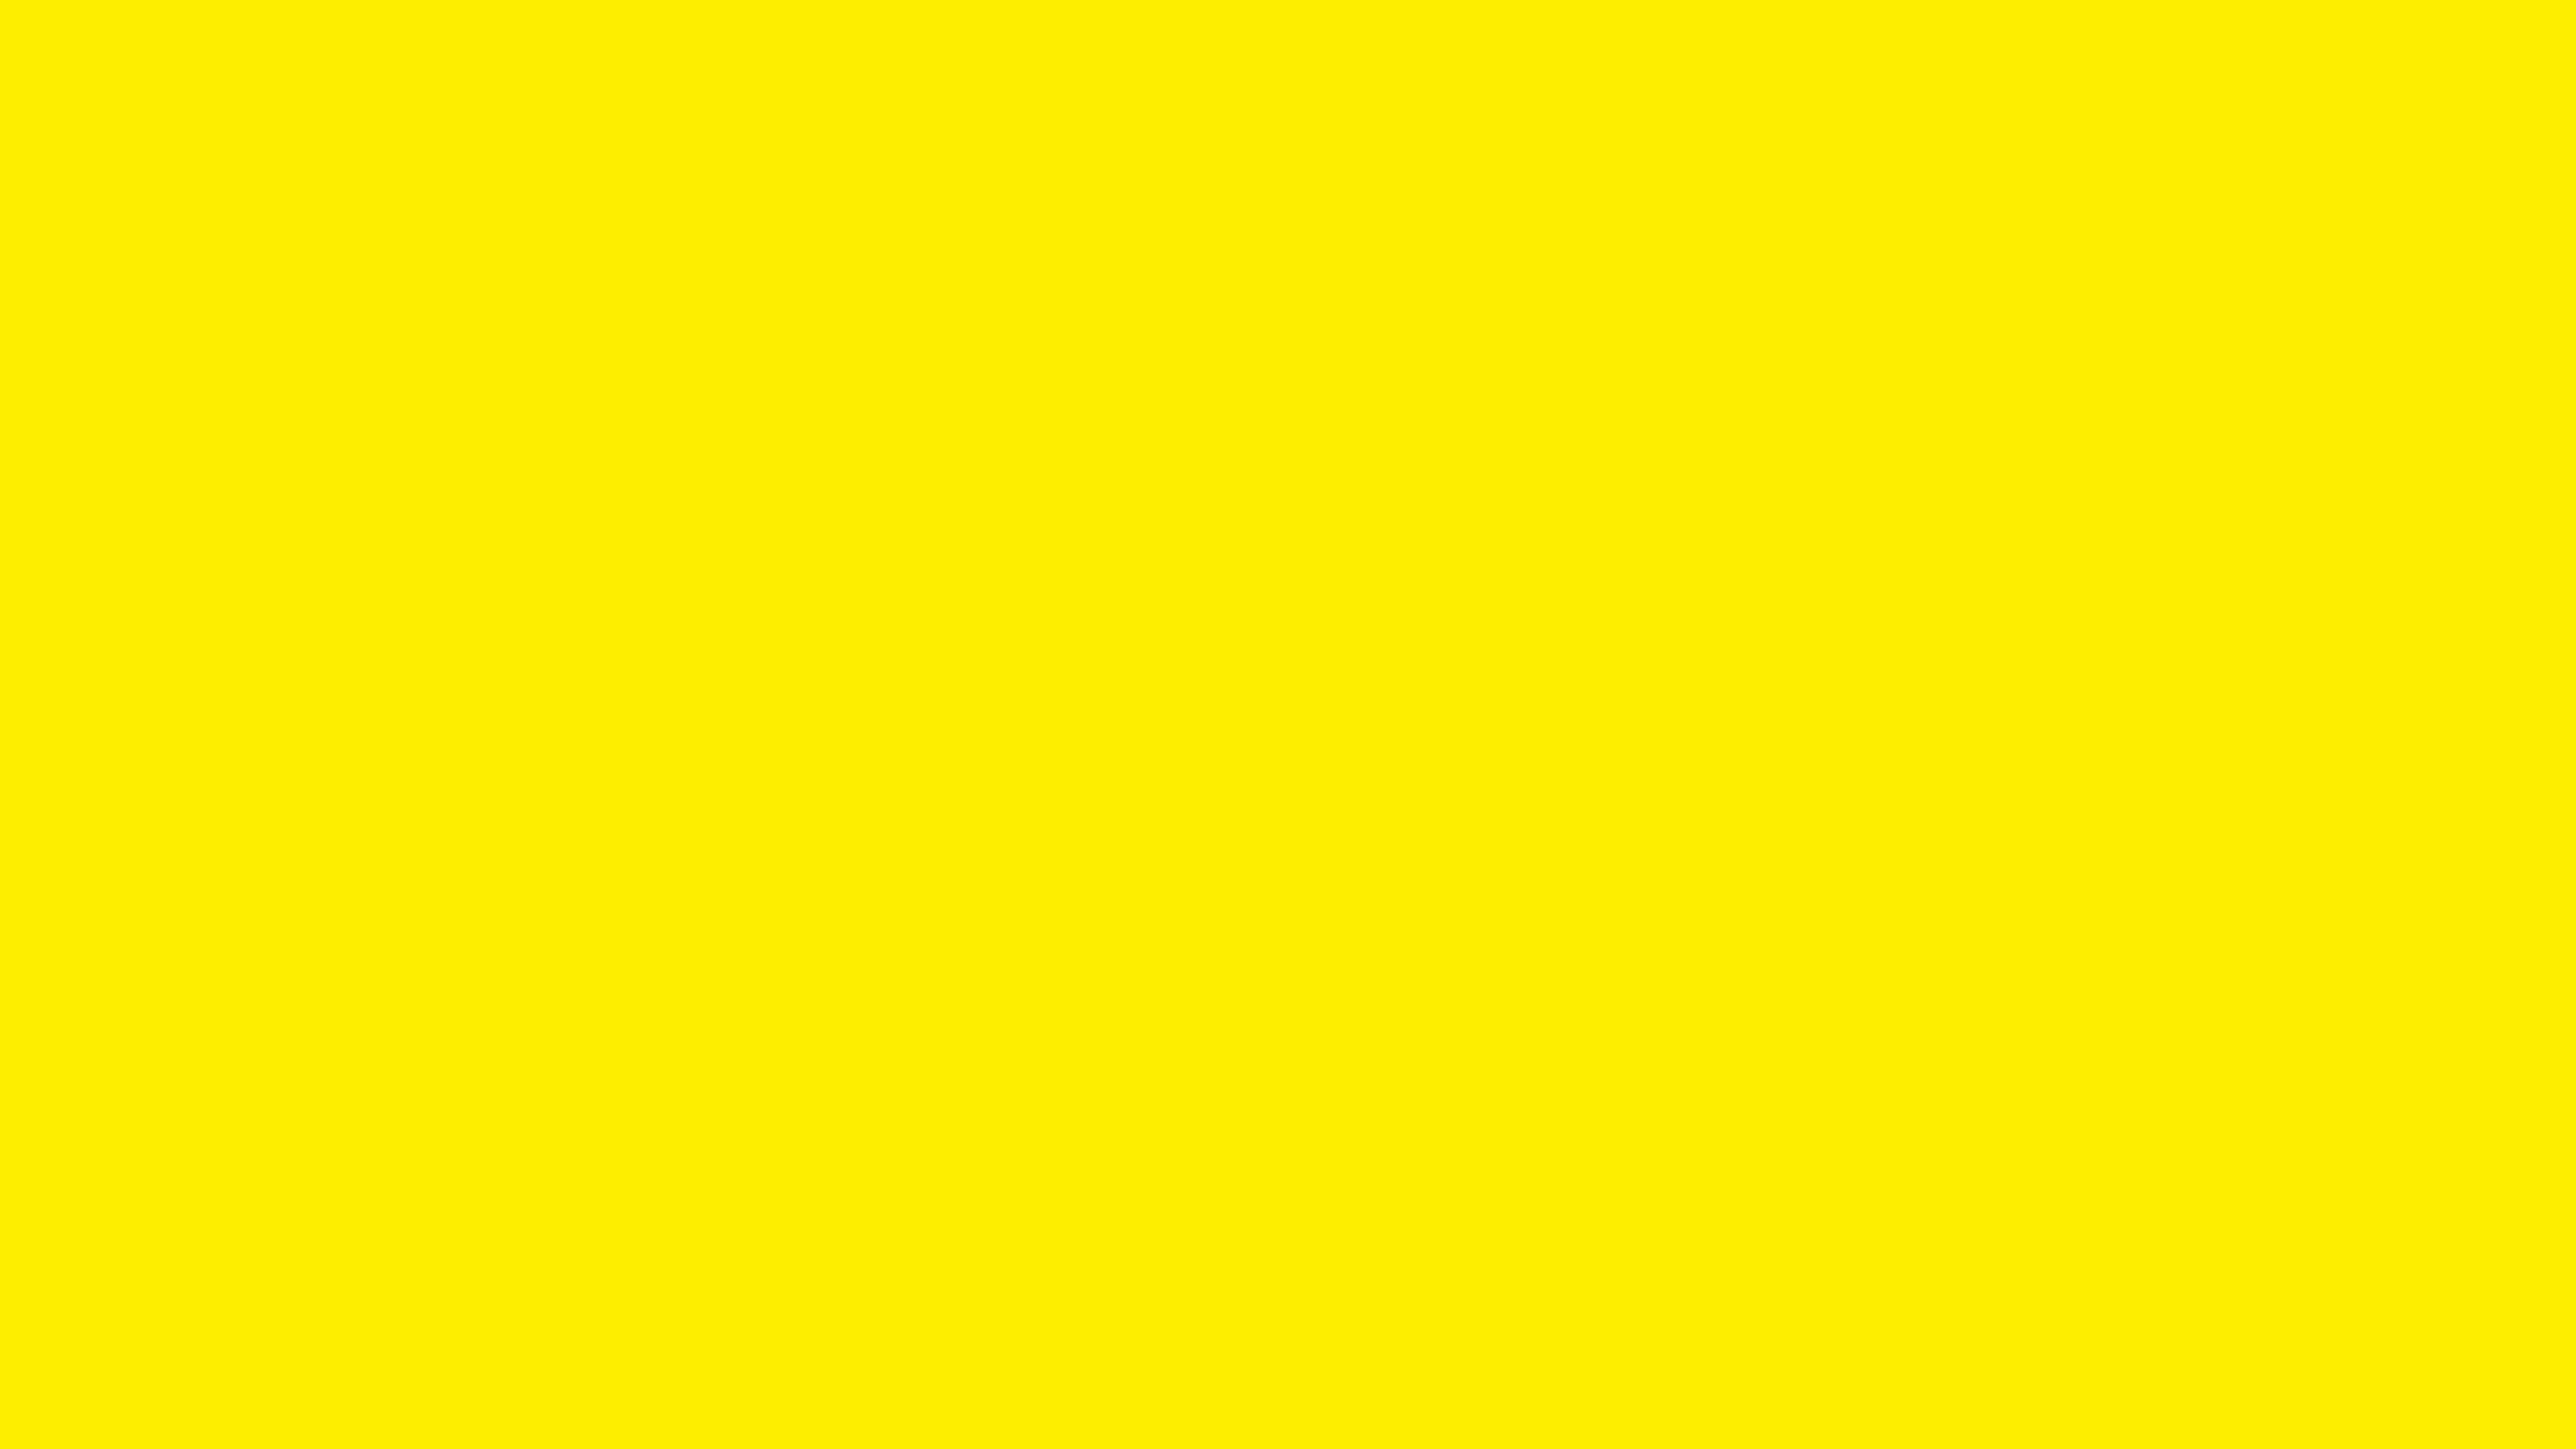 5120x2880 Aureolin Solid Color Background